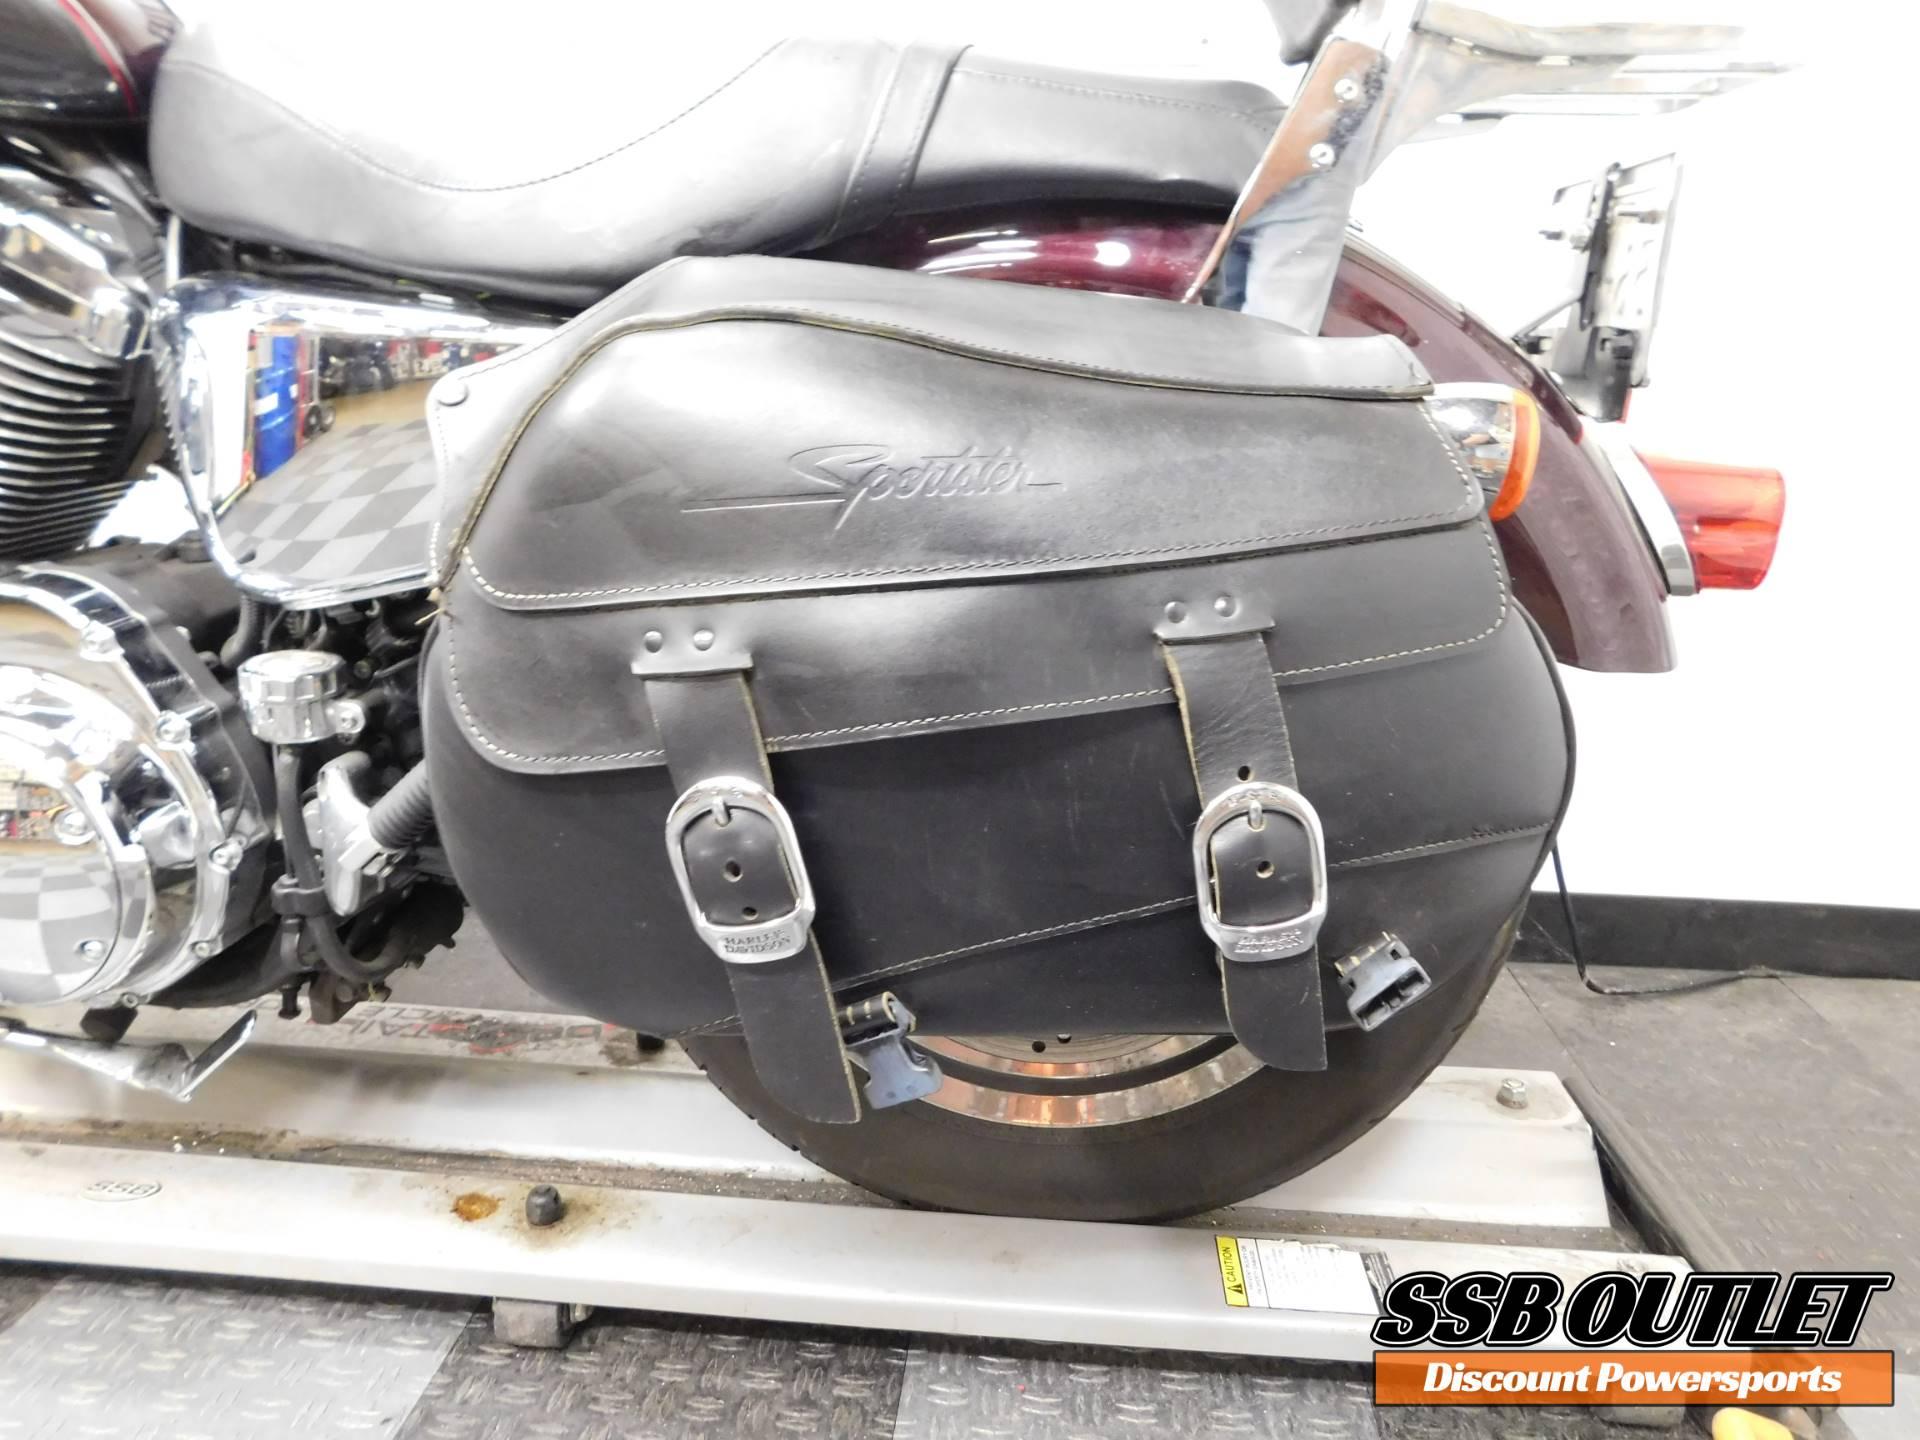 2006 Harley-Davidson Sportster 1200 Custom 7